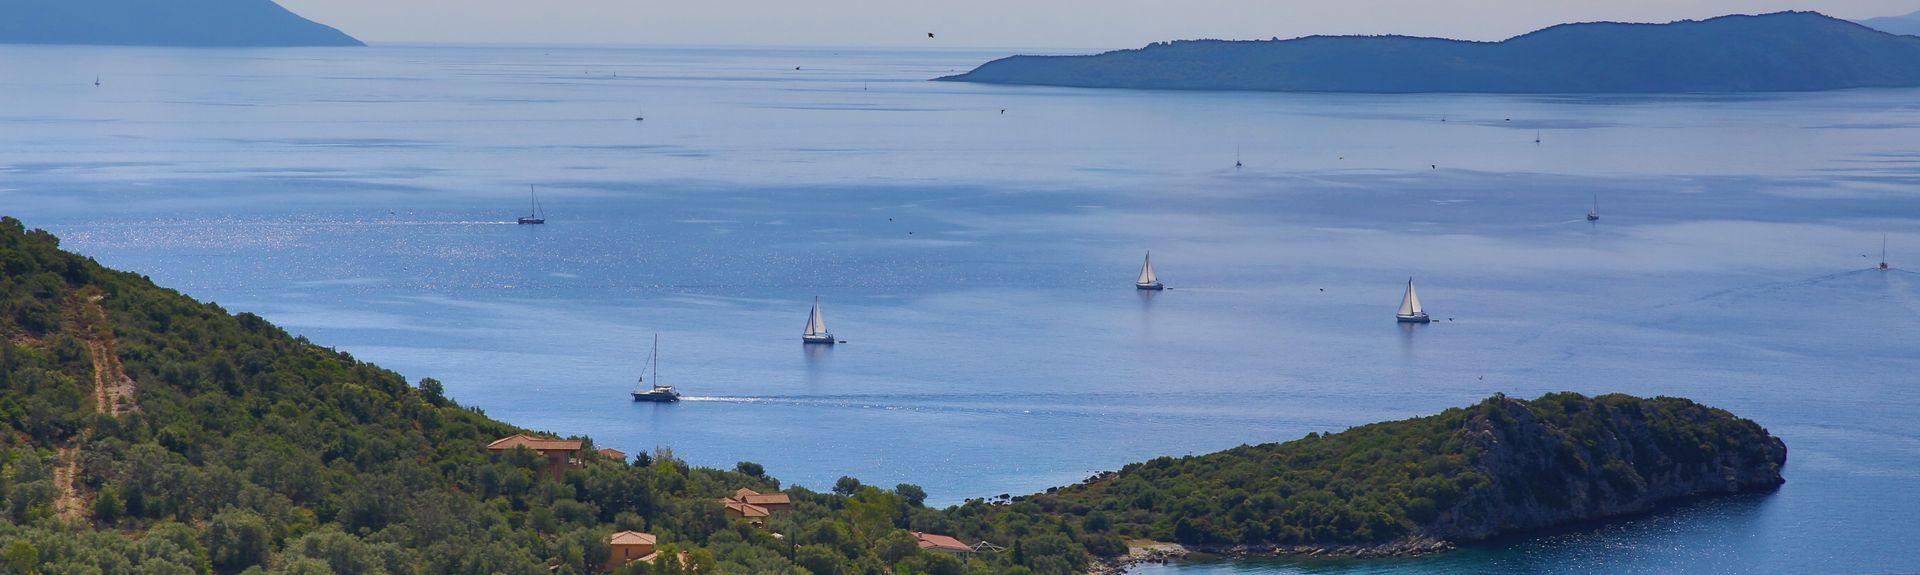 Poros, Lefkada, Ionian Islands Region, Greece